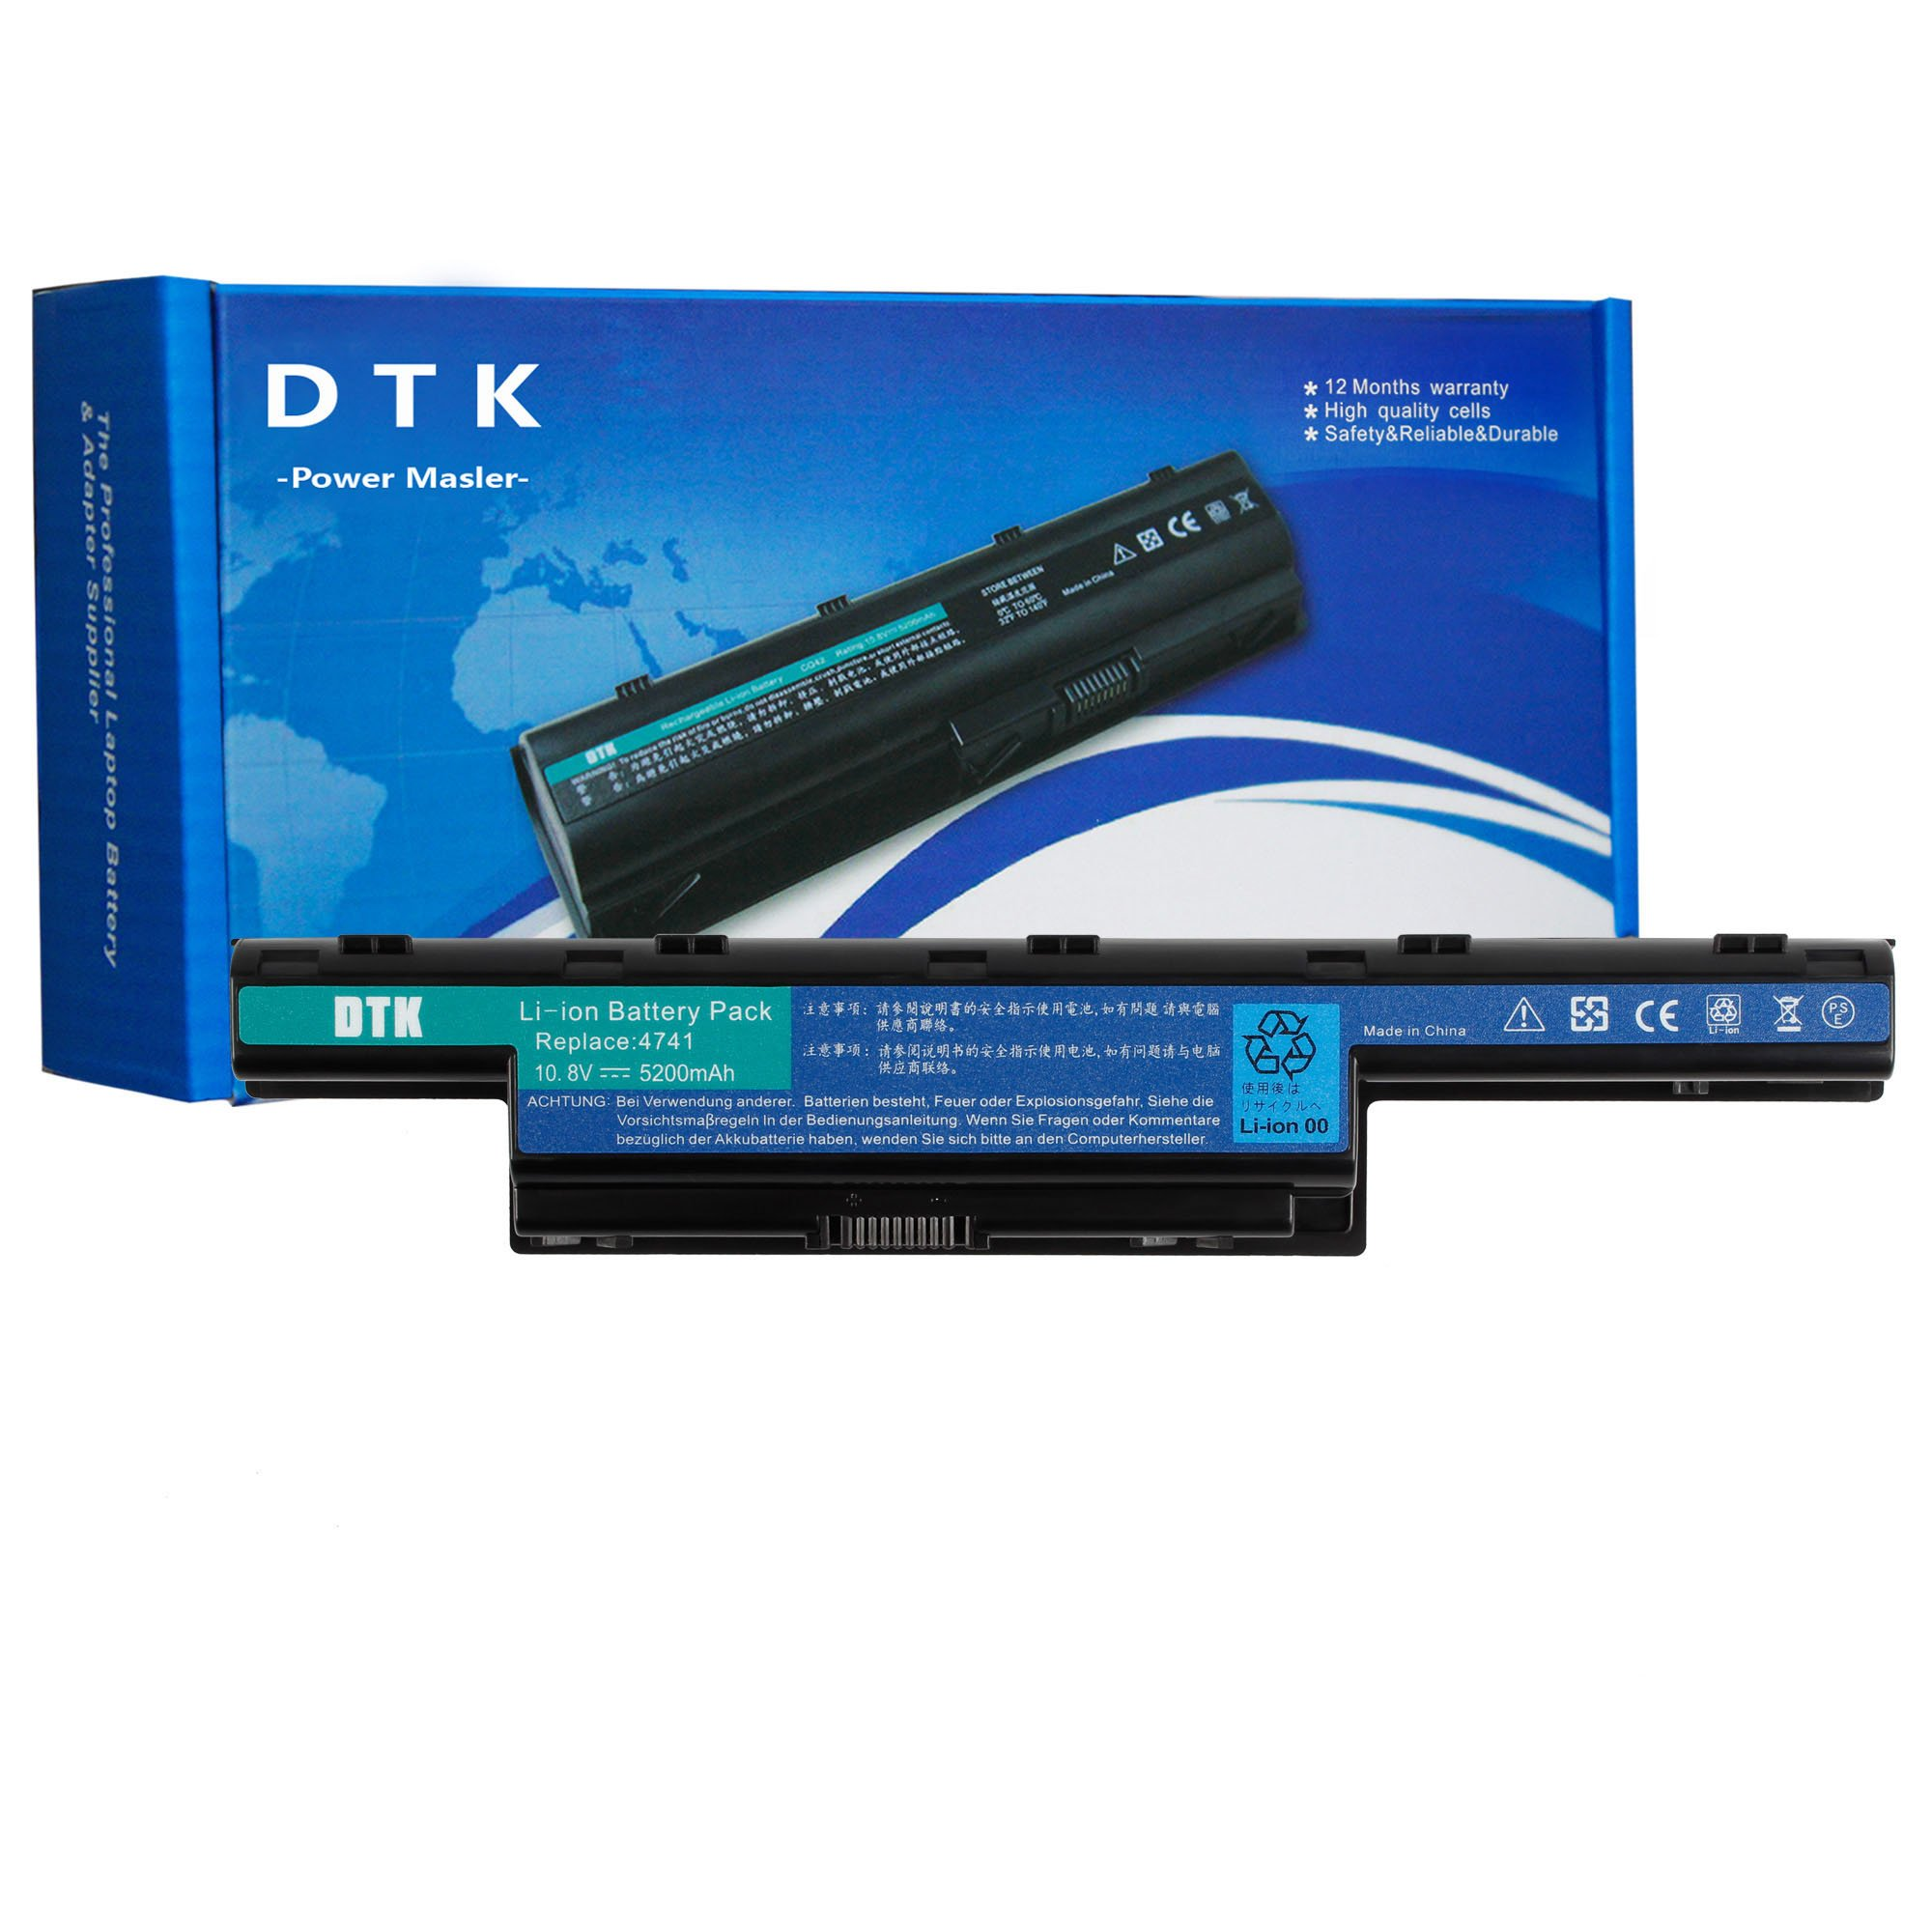 DTK 10.8V 5200mAh Laptop Battery for ACER Aspire 4250 4333 4551 4741 4743 5250 5253 5336 5552 5733 5741 5742 5750 5755 TravelMate 5735 5740 5742 Gateway NV50A NV53A NV55C NV59C